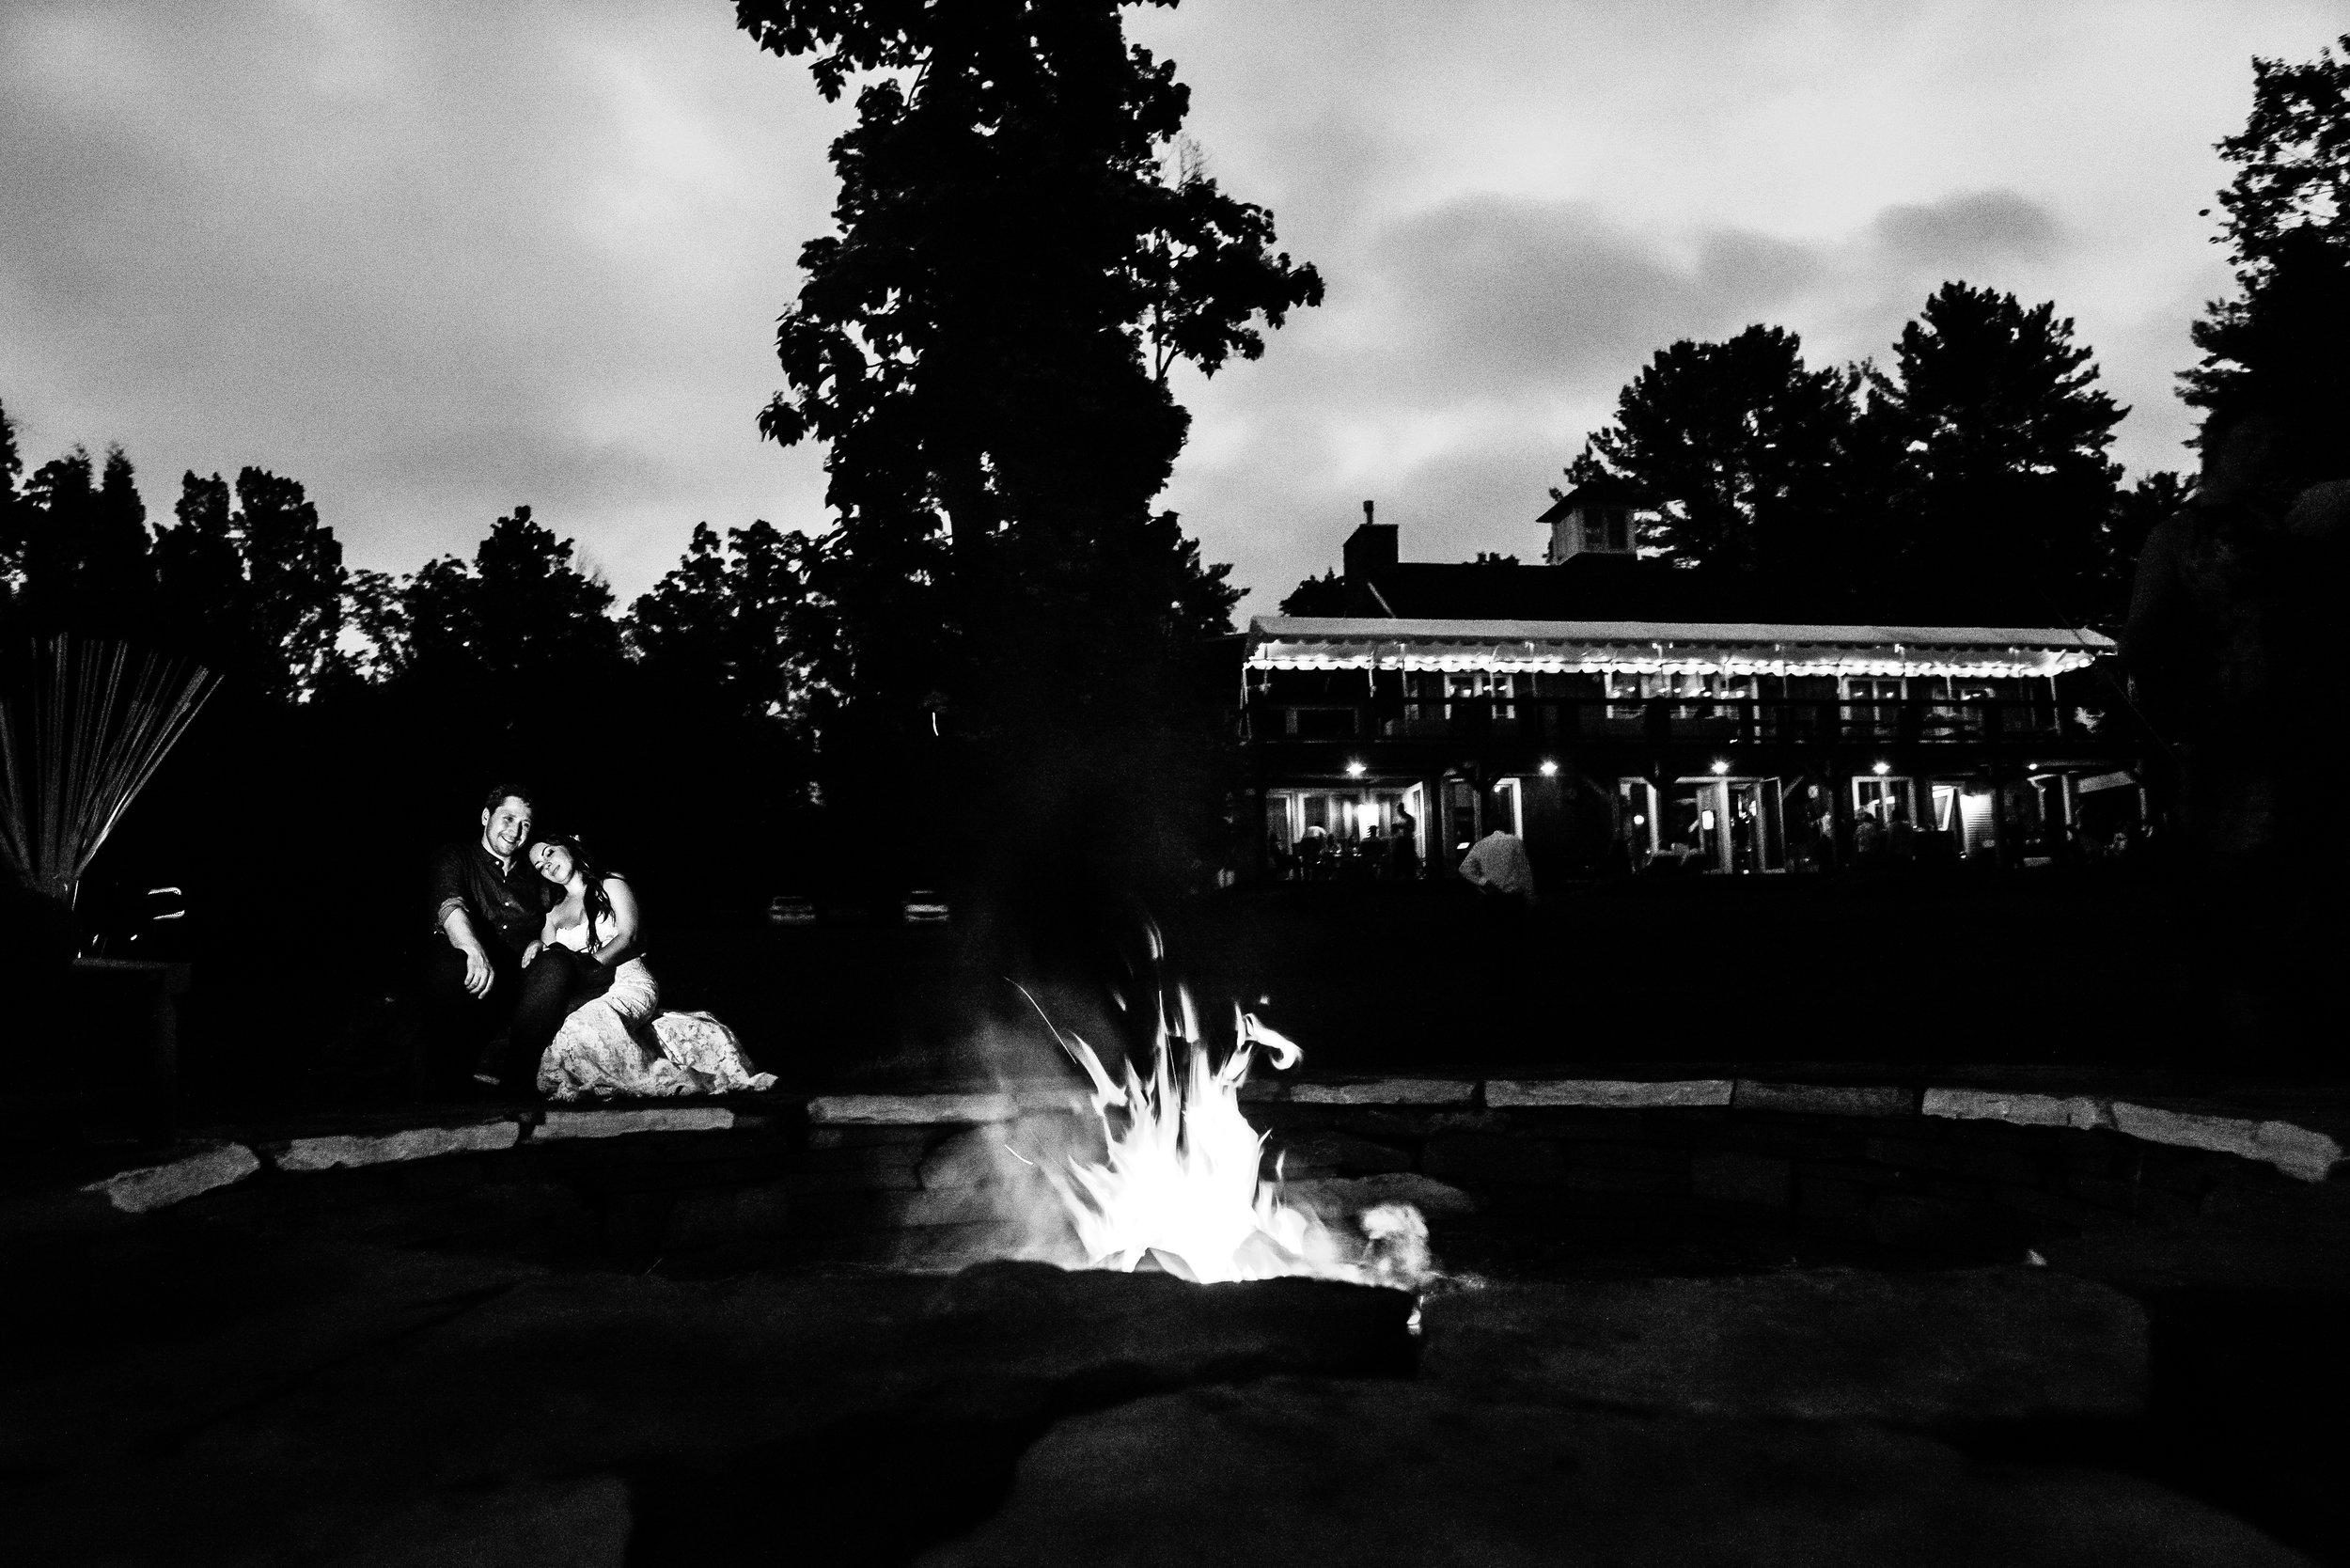 Stefy Hilmer Photography -bride and groom at bonfire after wedding reception.jpg